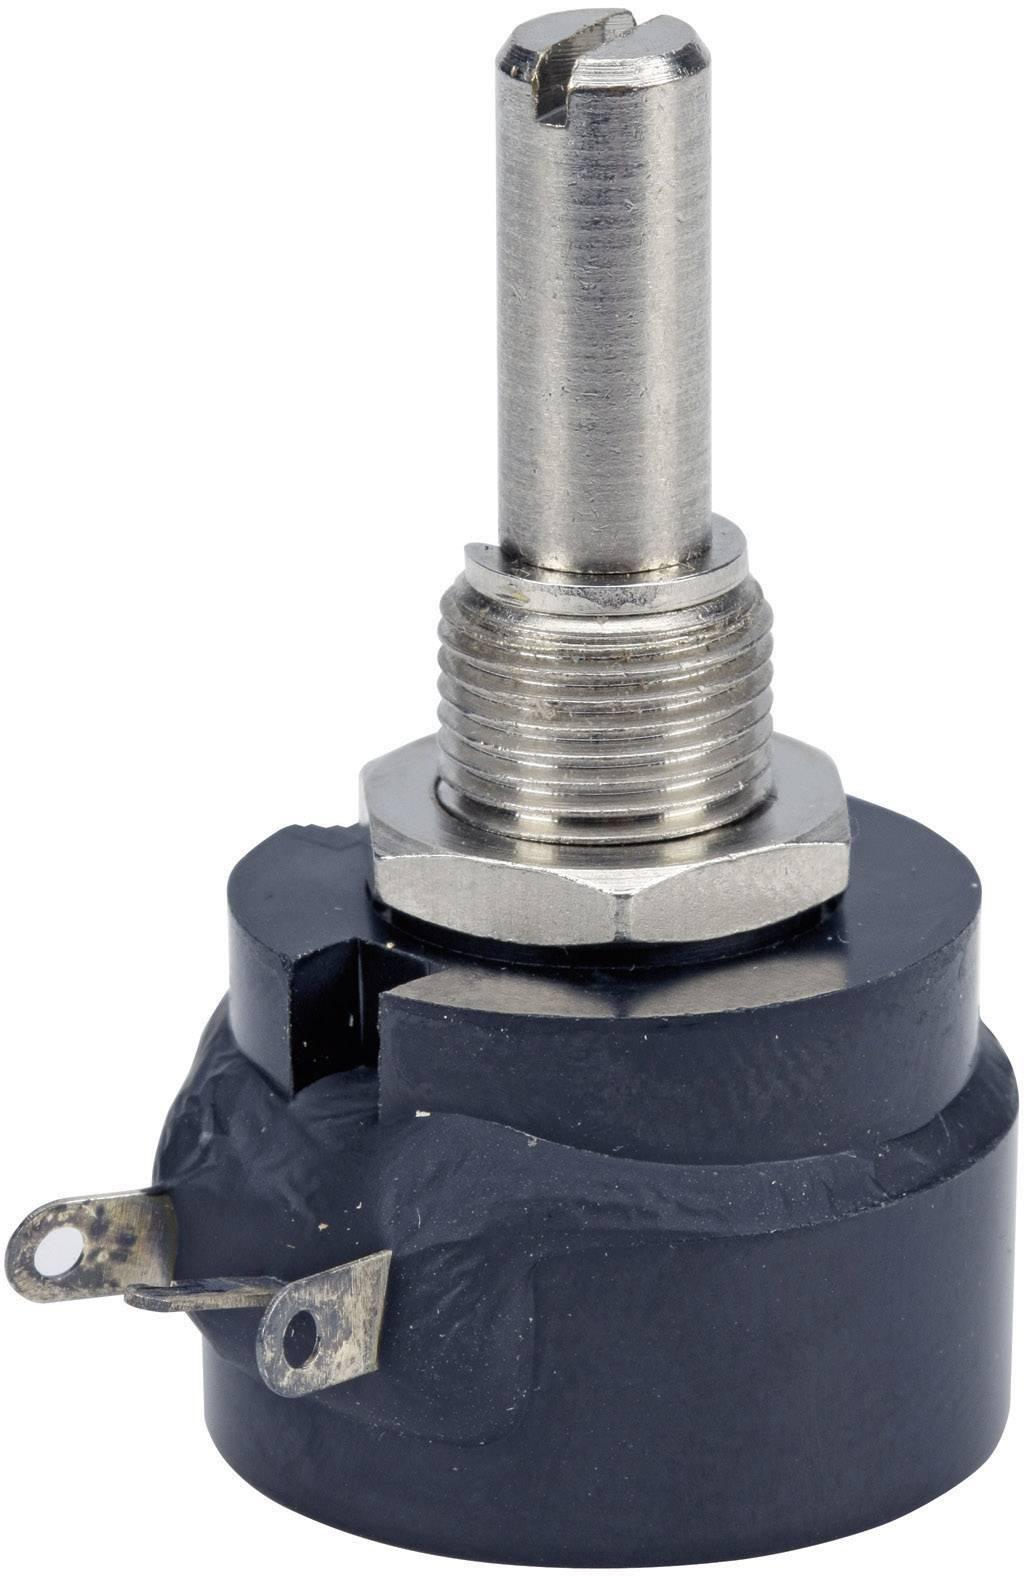 Drôtový potenciometer TT Electro, 3101206125, 250 Ω, 0.5 W, ± 10%